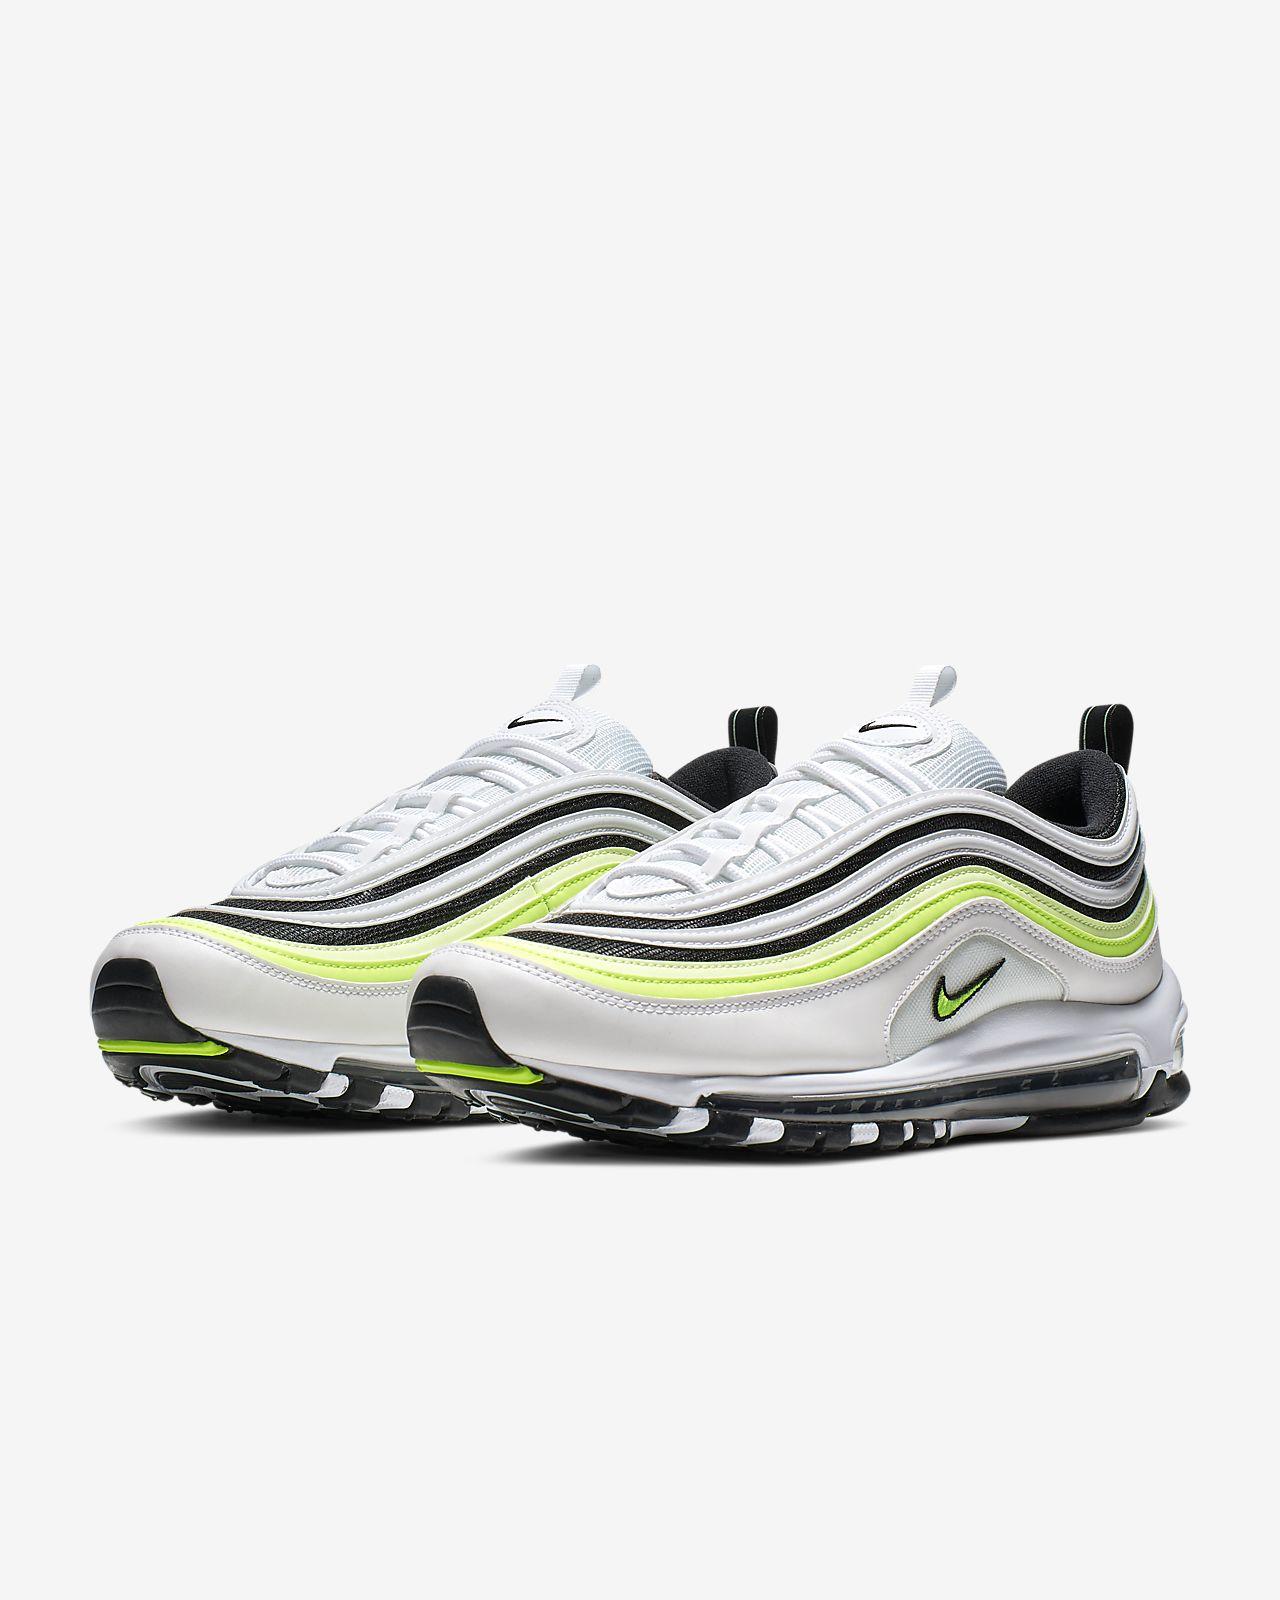 best website 3bd62 e3ee6 Nike Air Max 97 SE Men's Shoe